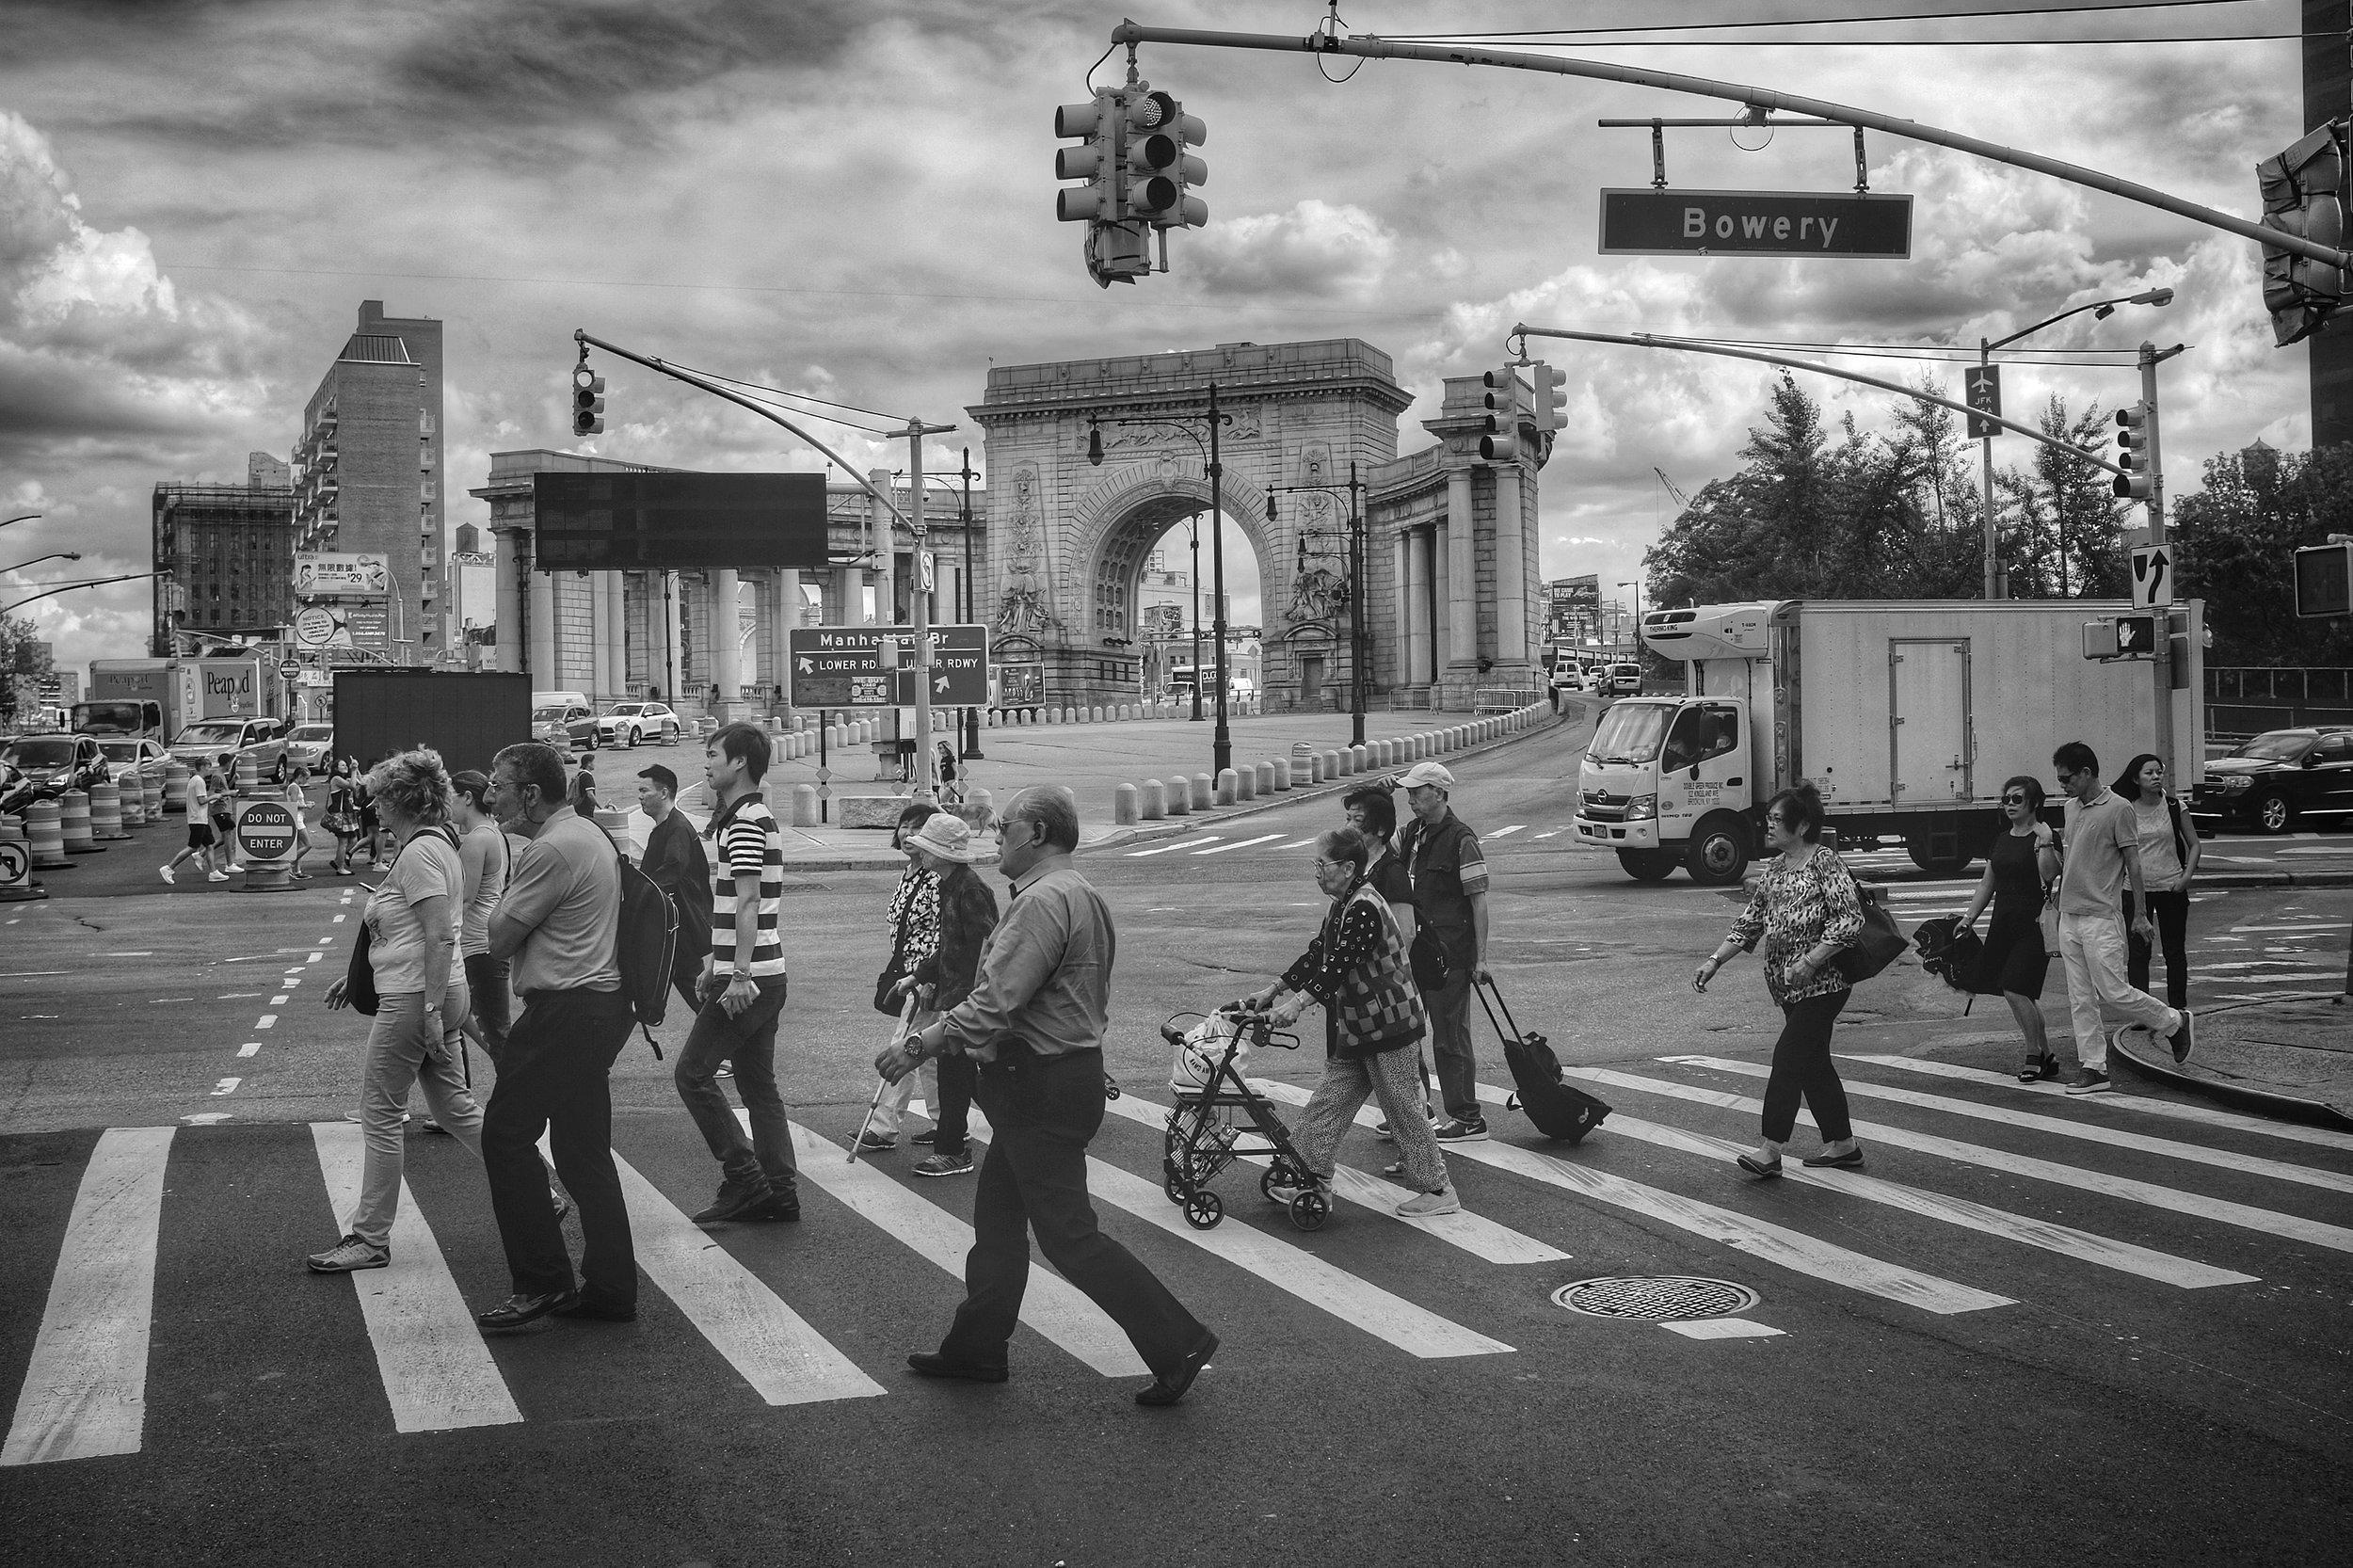 Canal Street and Bowery. Manhattan Bridge Entrance. Chinatown. New York City. 2016.